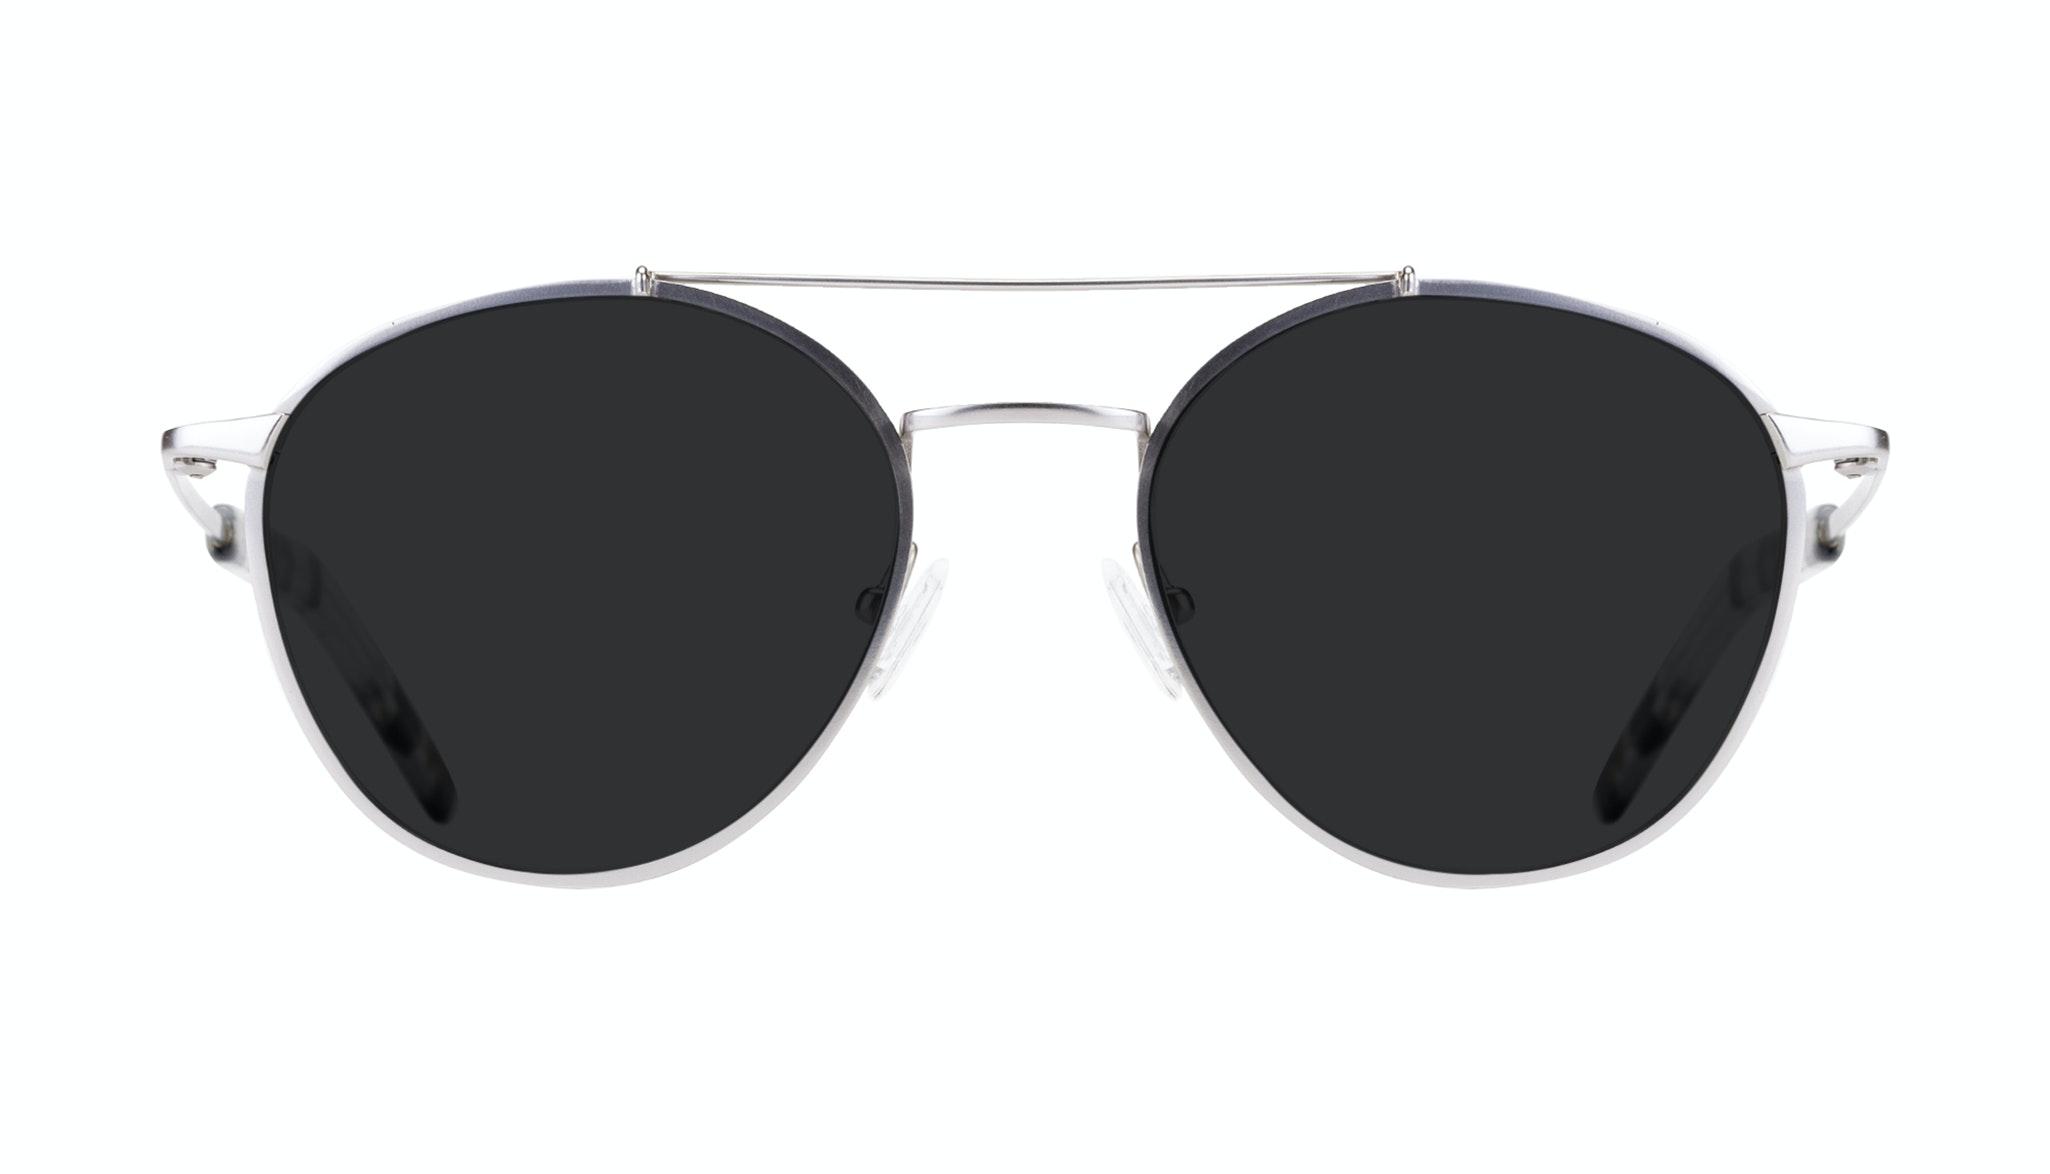 Affordable Fashion Glasses Aviator Sunglasses Men Gravity Silver